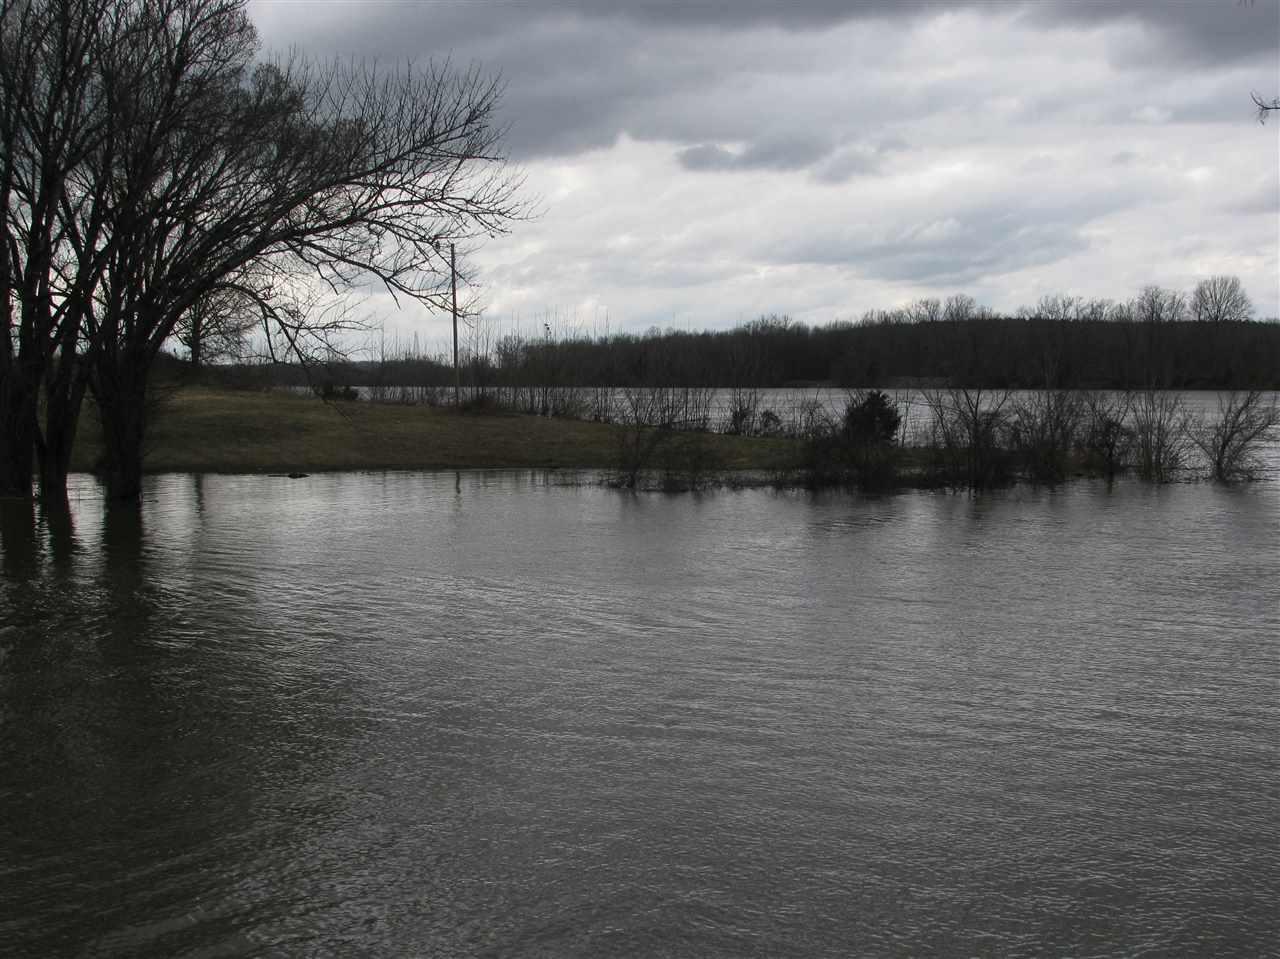 1 Water Clifton, TN 38425 - MLS #: 10021170